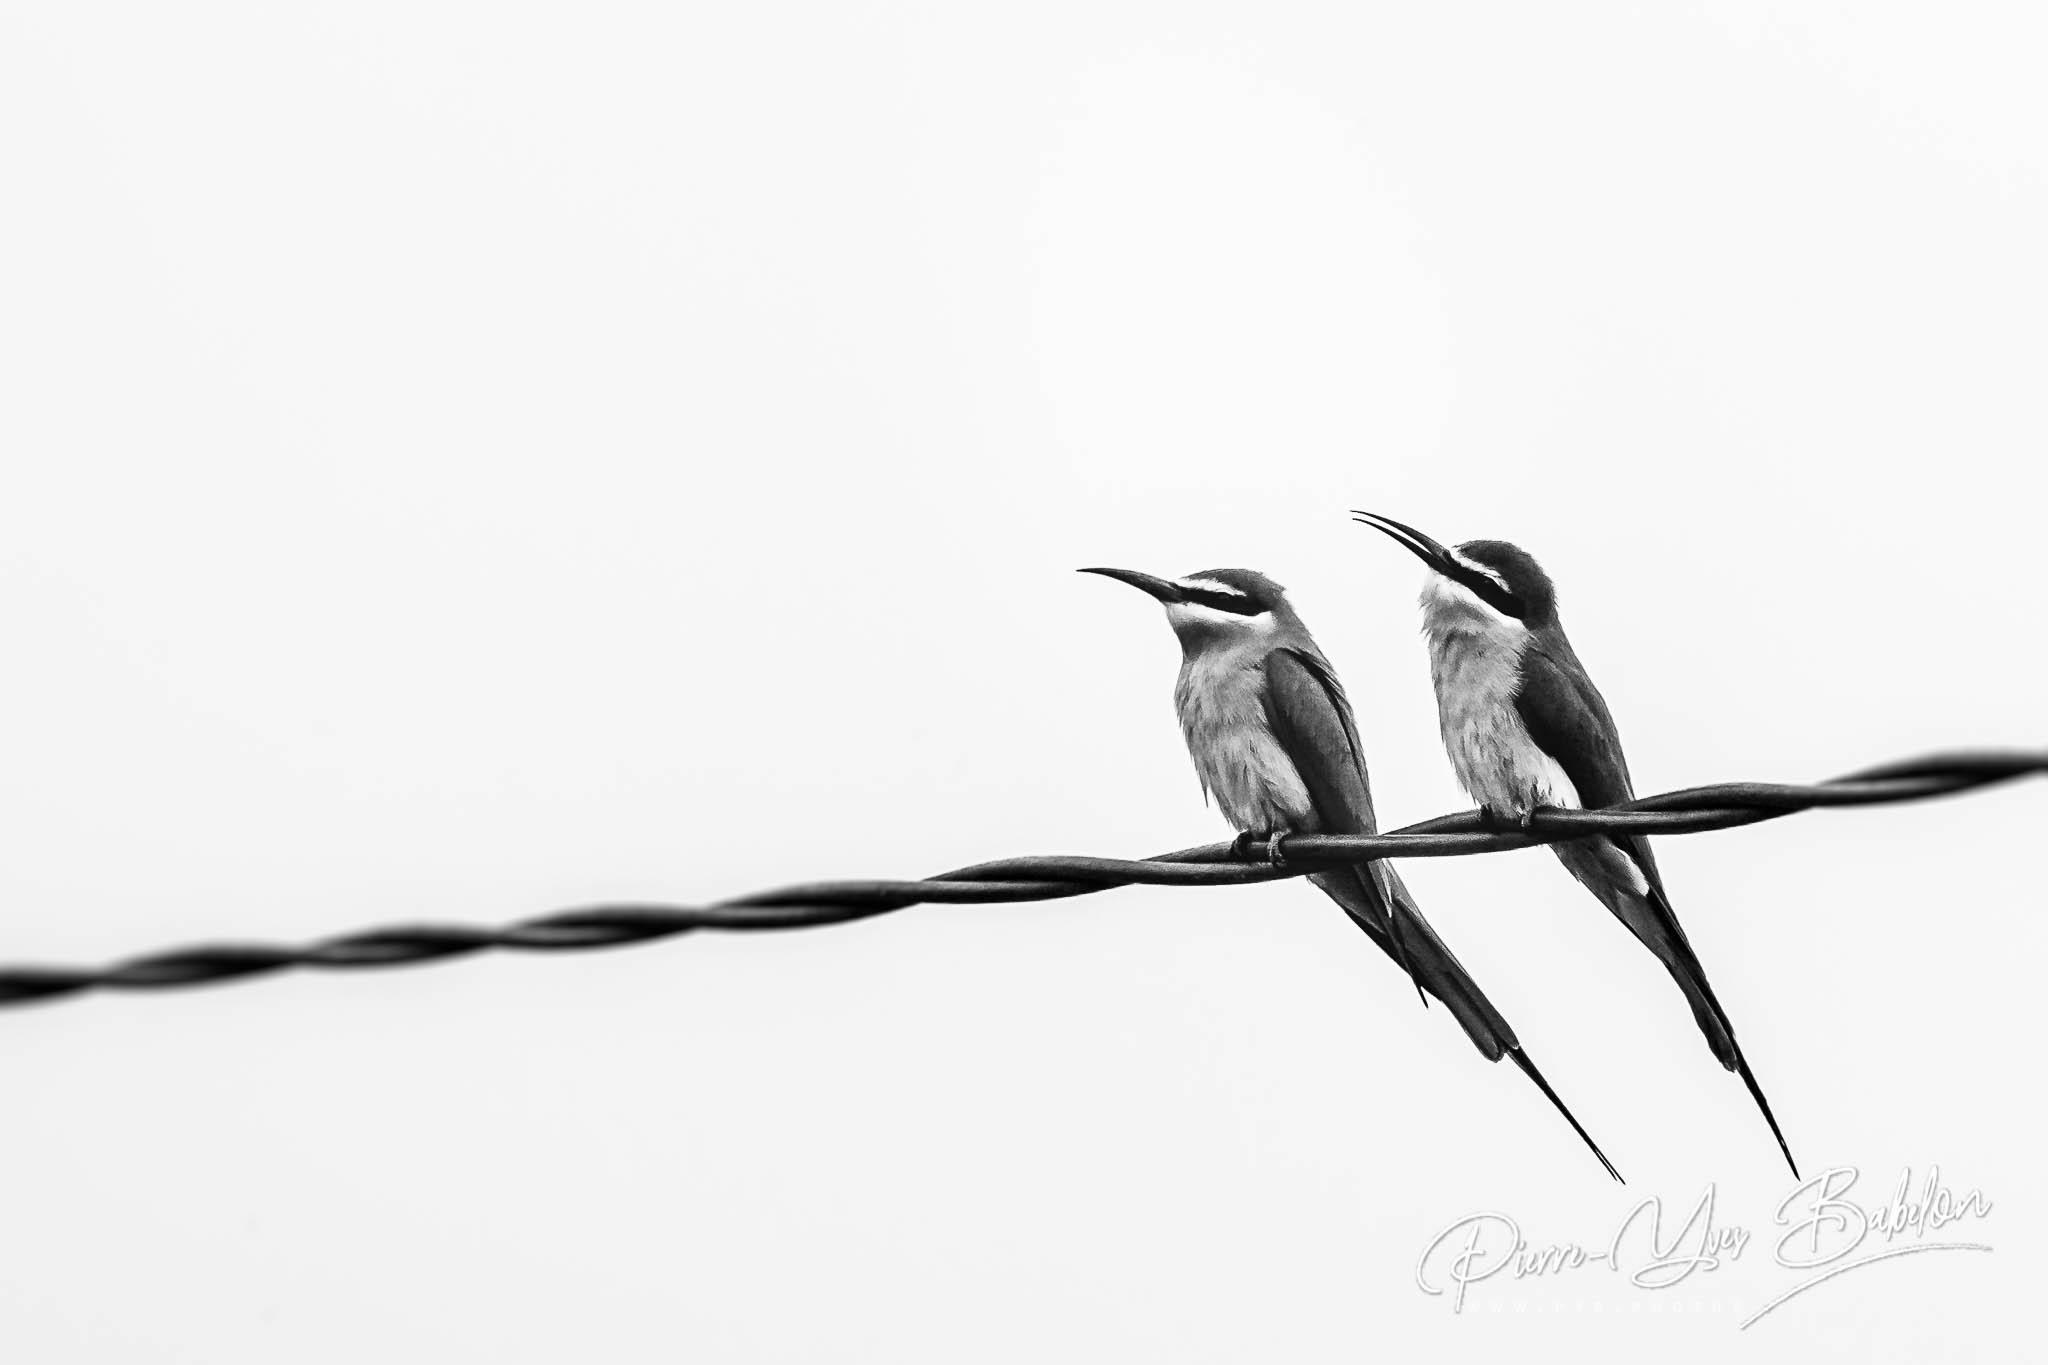 Guepiers de Madagascar (green bee-eaters)